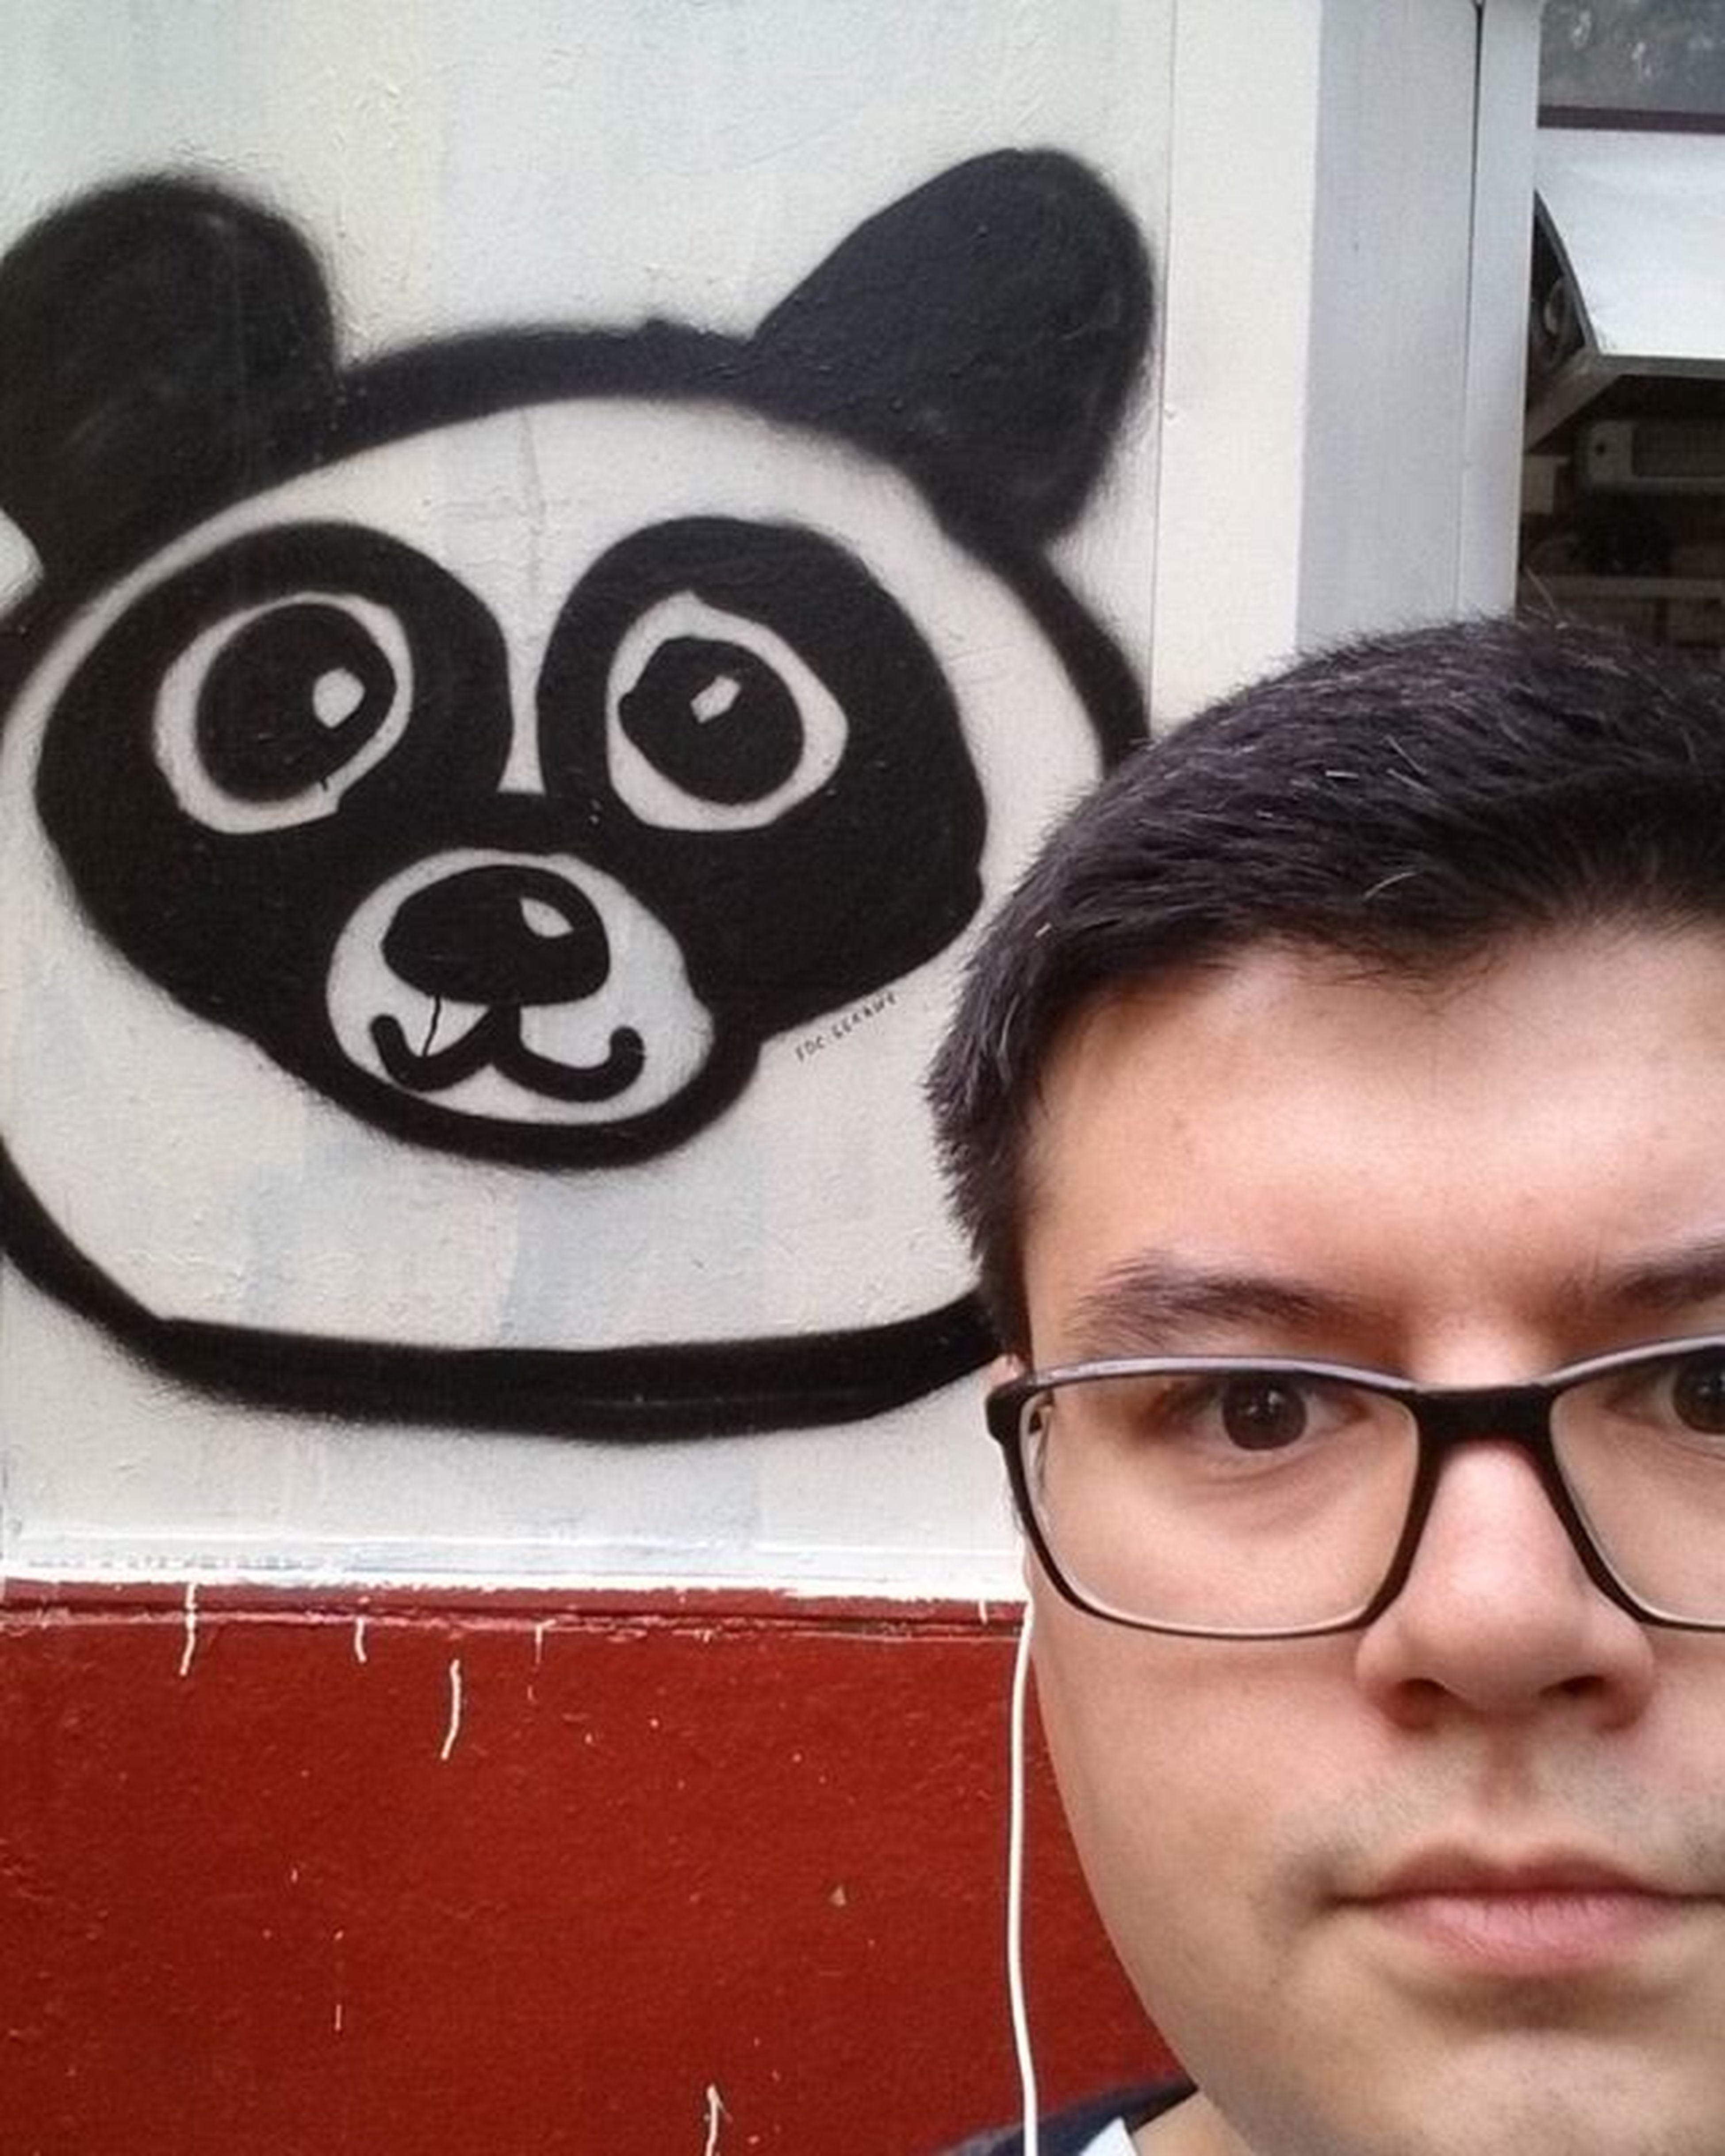 хуелфи Huelfie Panda Graffiti Tag Граффити панда Тэг беляш